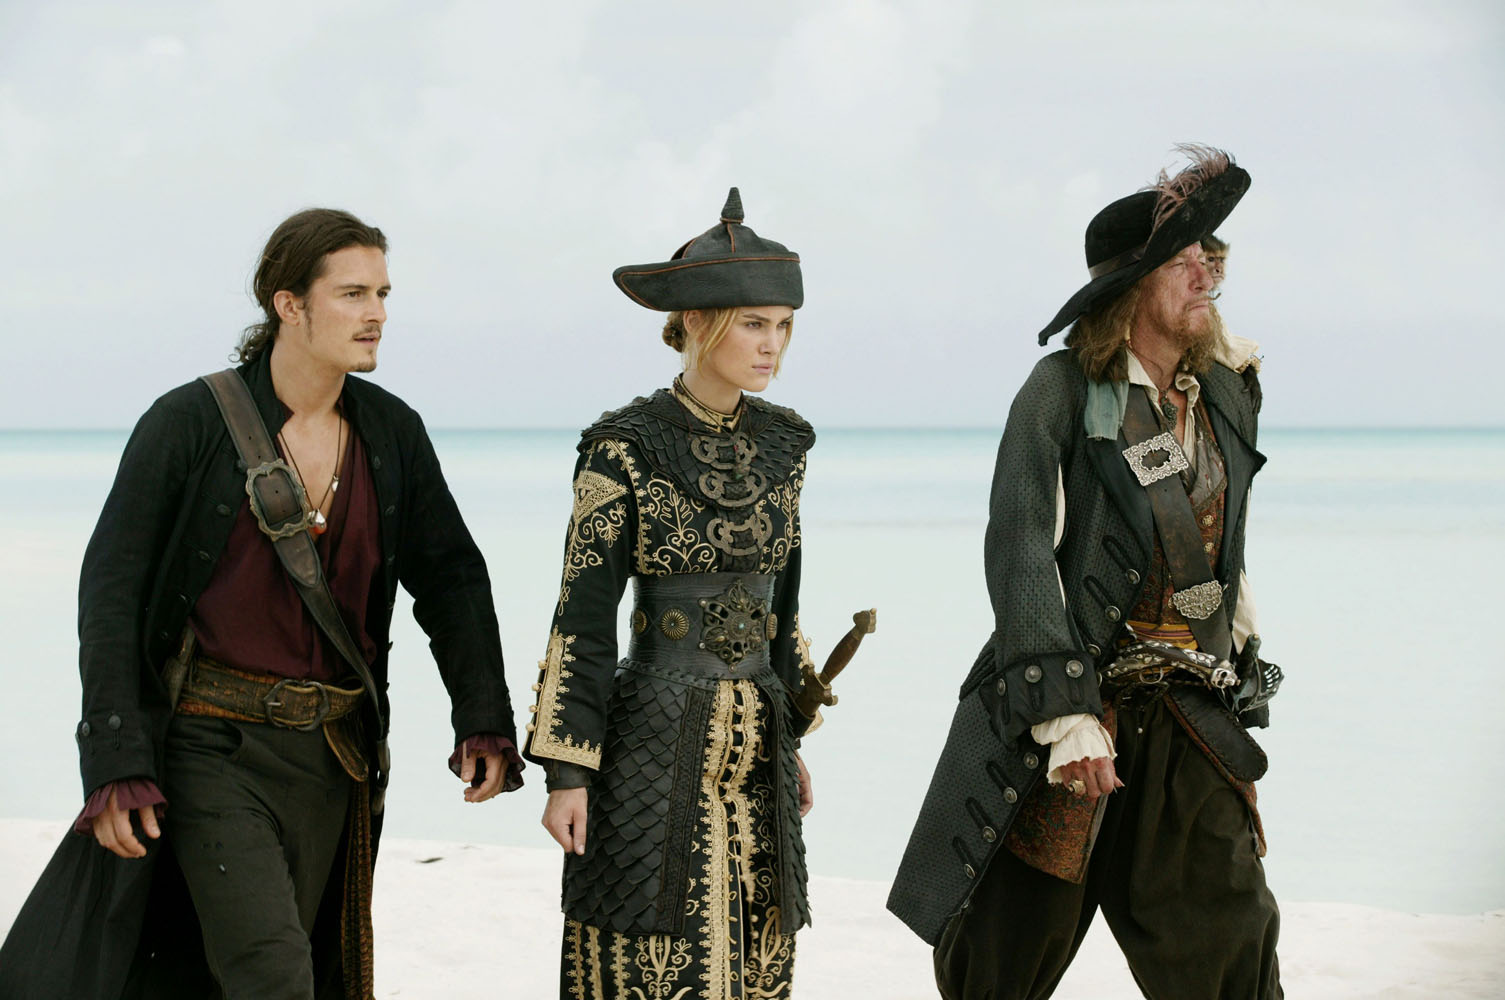 кадры из фильма Пираты Карибского моря: На краю света Джеффри Раш, Орландо Блум, Кира Найтли,